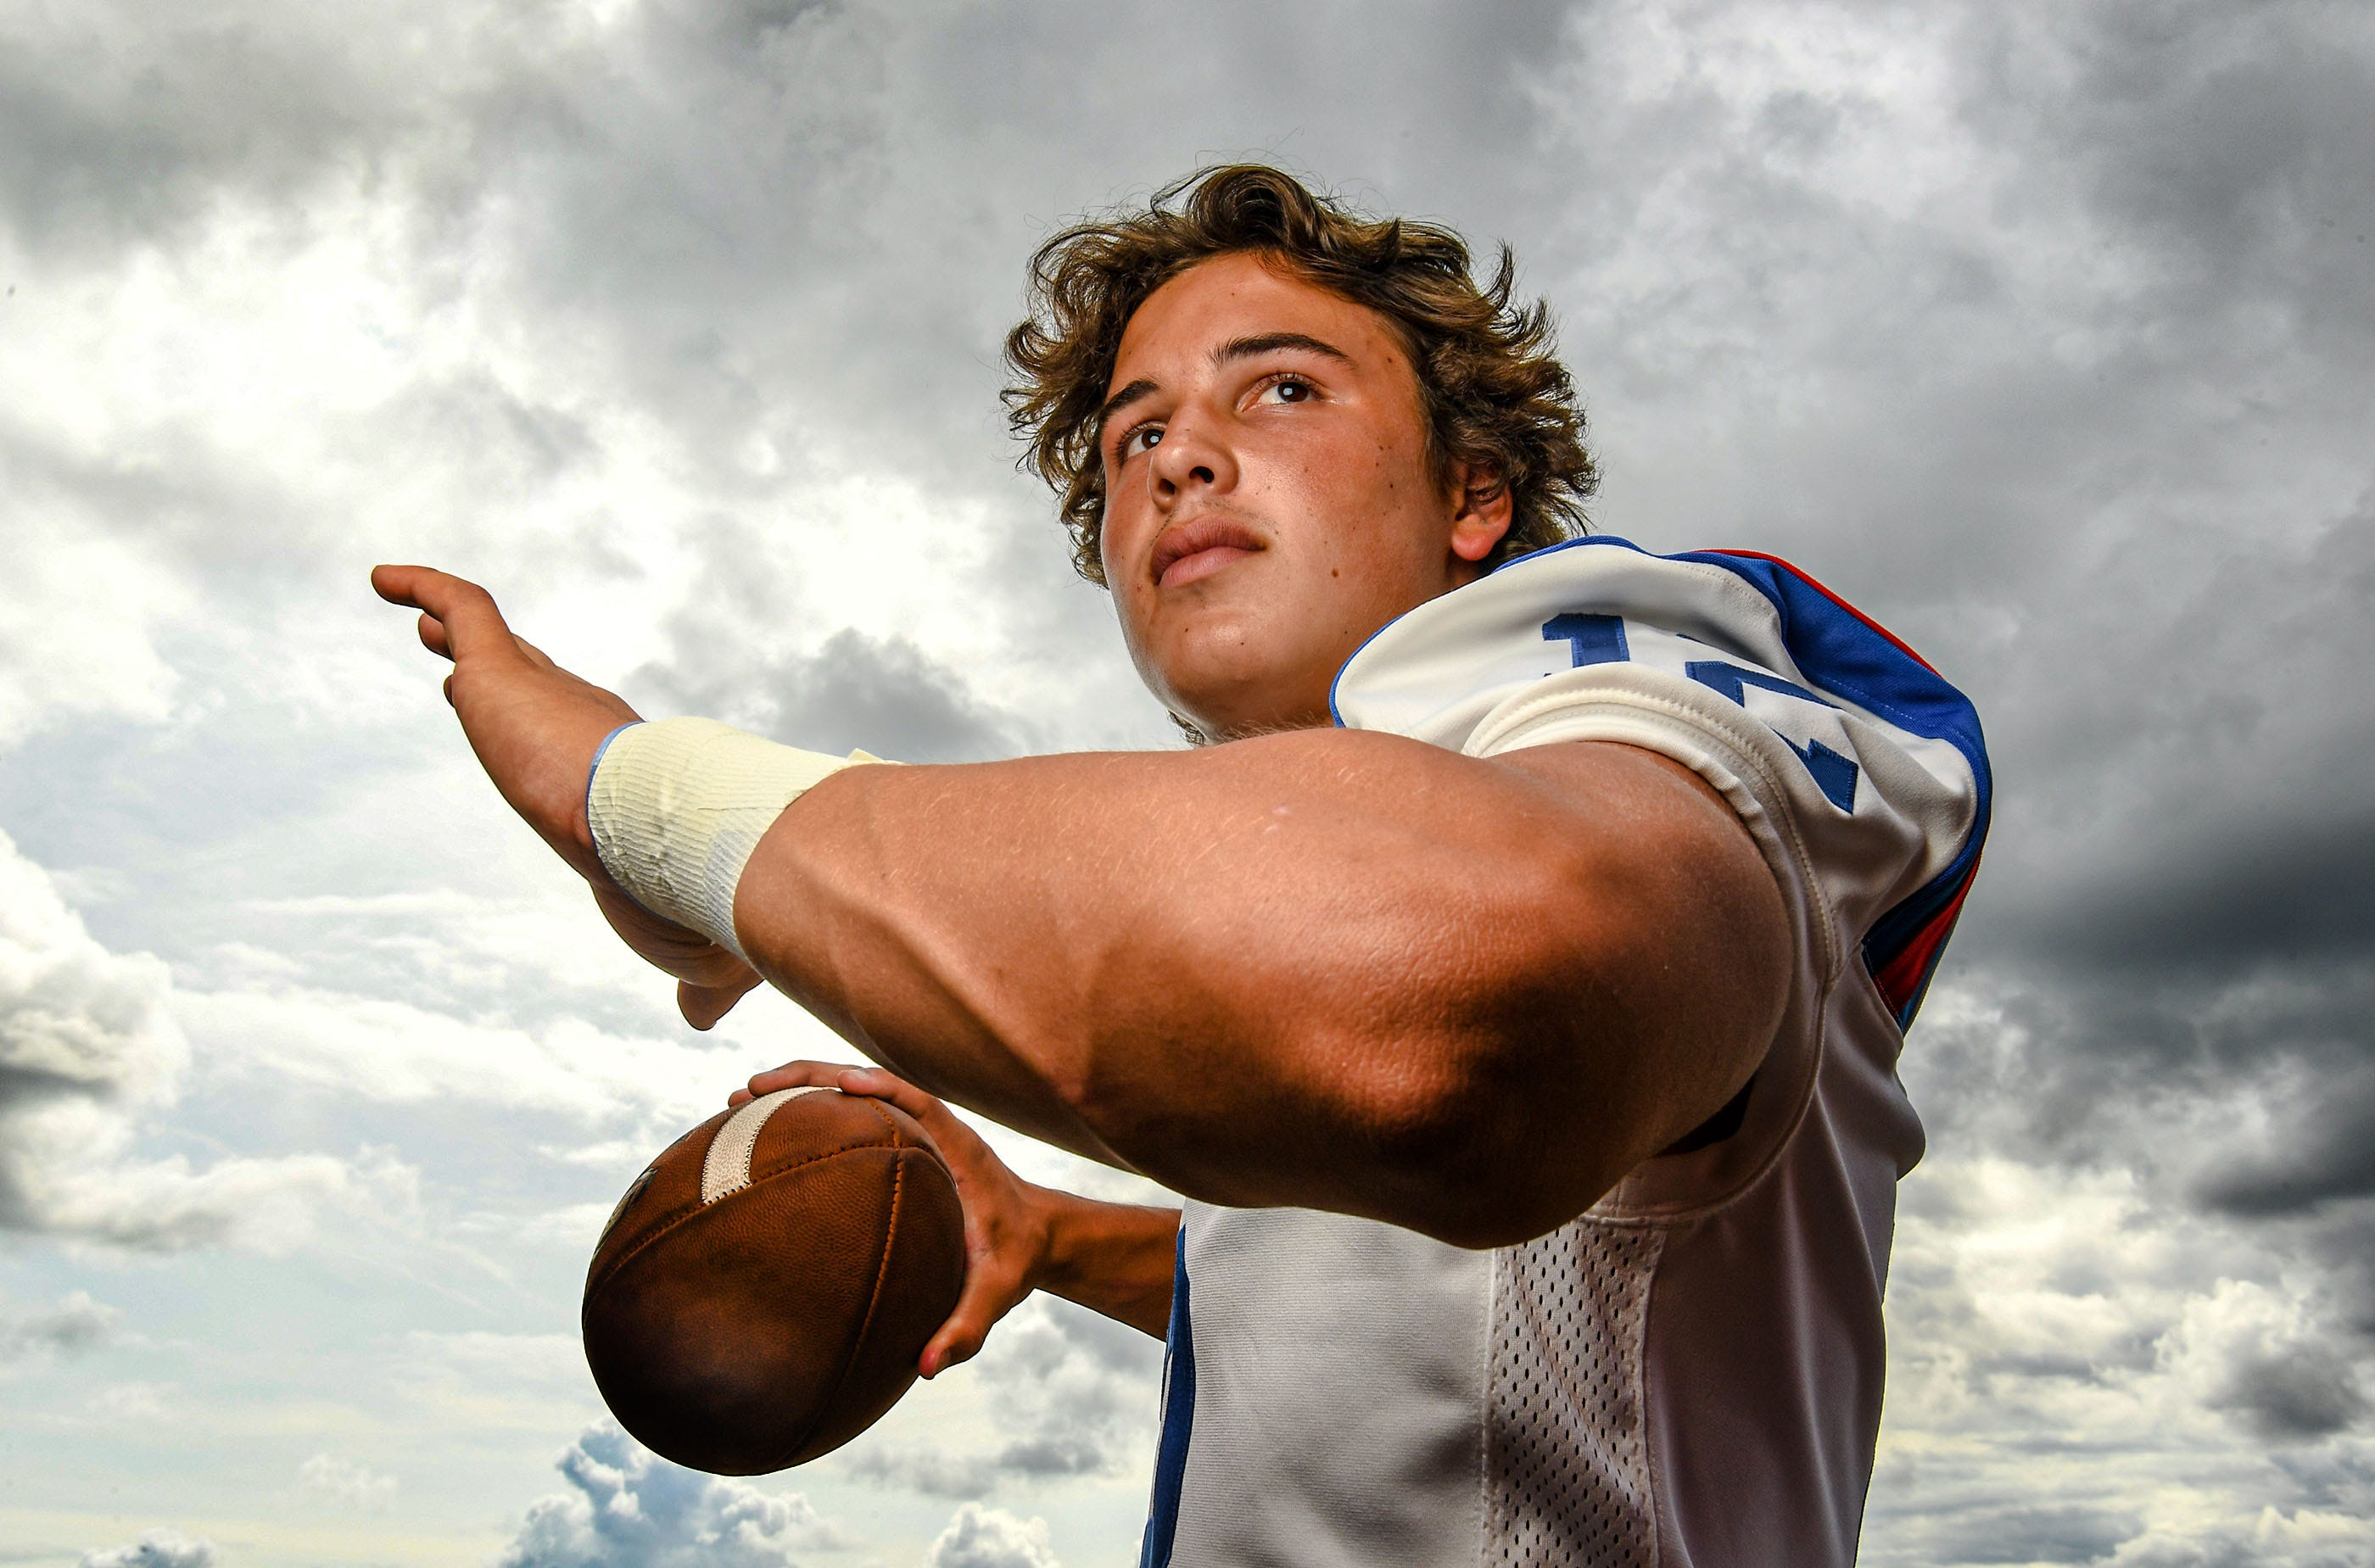 Pickens football quarterback Drew Campbell in Pickens, S.C. September 2020.